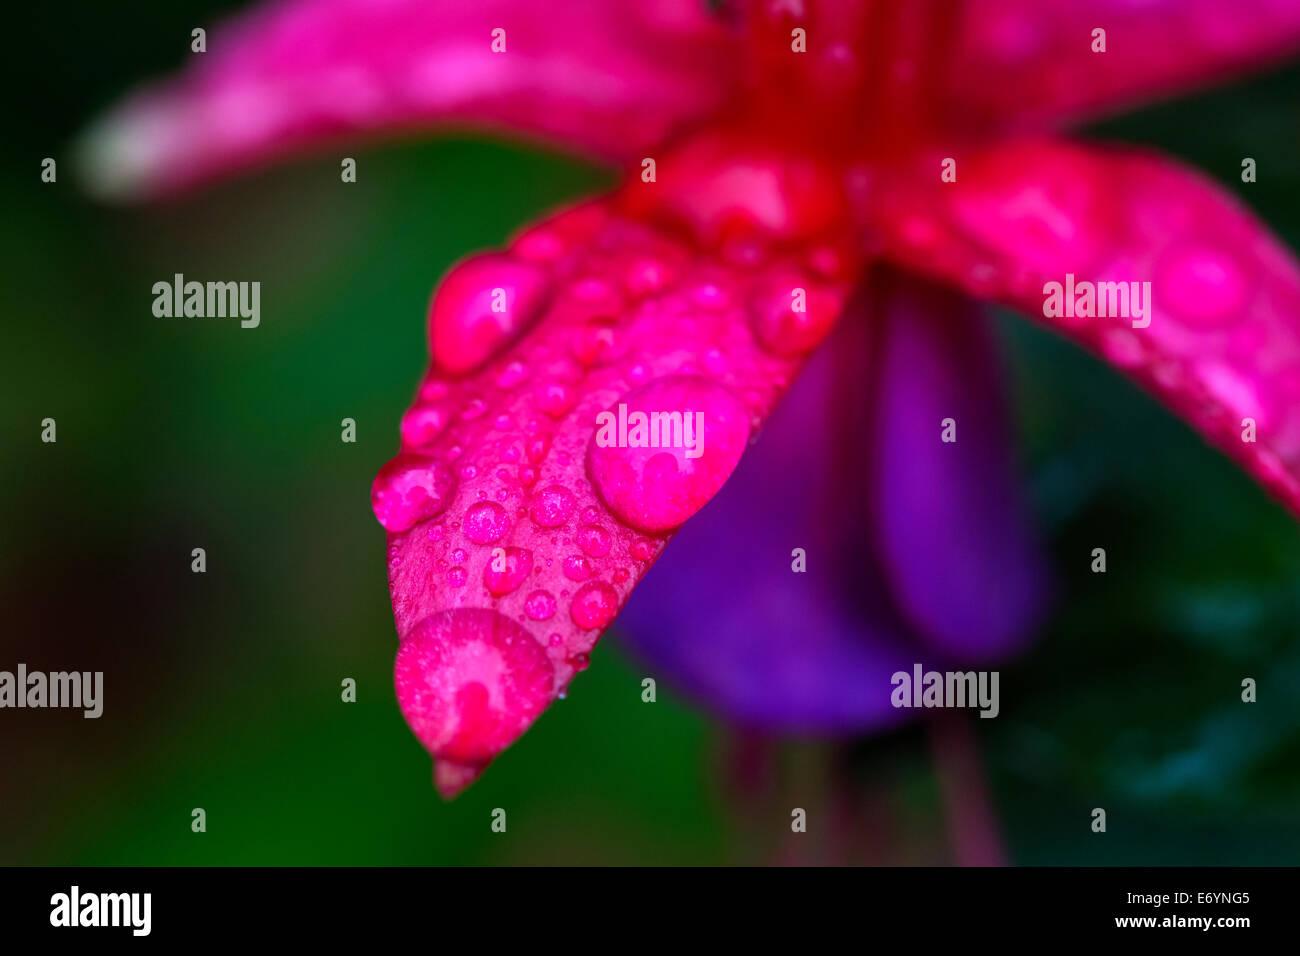 Summer rain drops on Garden plant Fushia purple and red flower - Stock Image